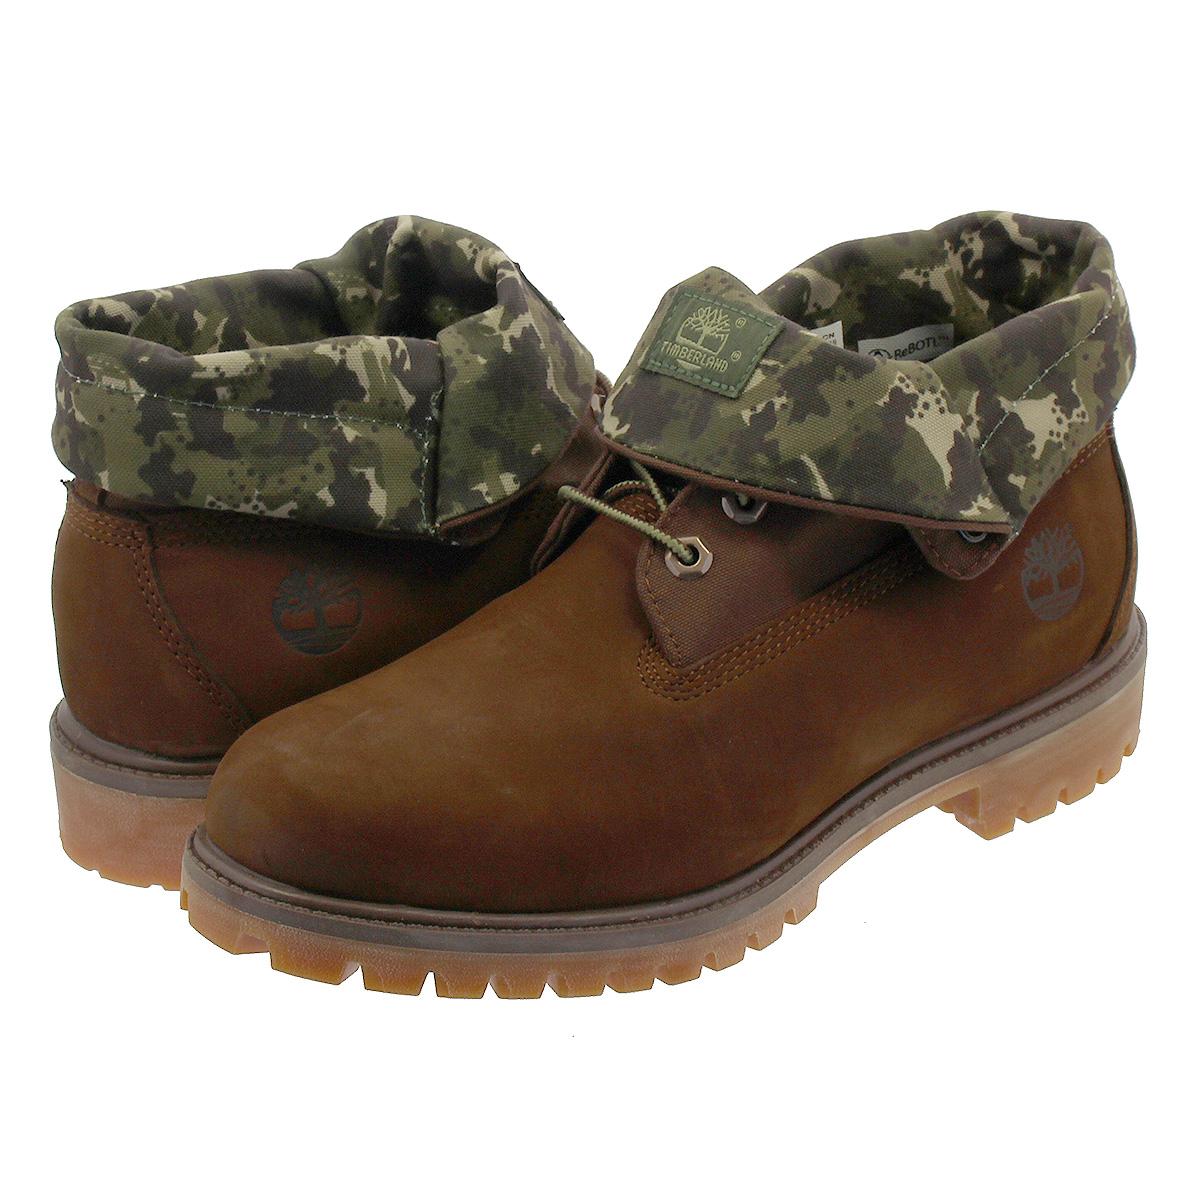 193c5336ac6 TIMBERLAND ROLL TOP BOOT Timberland roll top boot POTTING SOIL/GREEN CAMO  a21ap